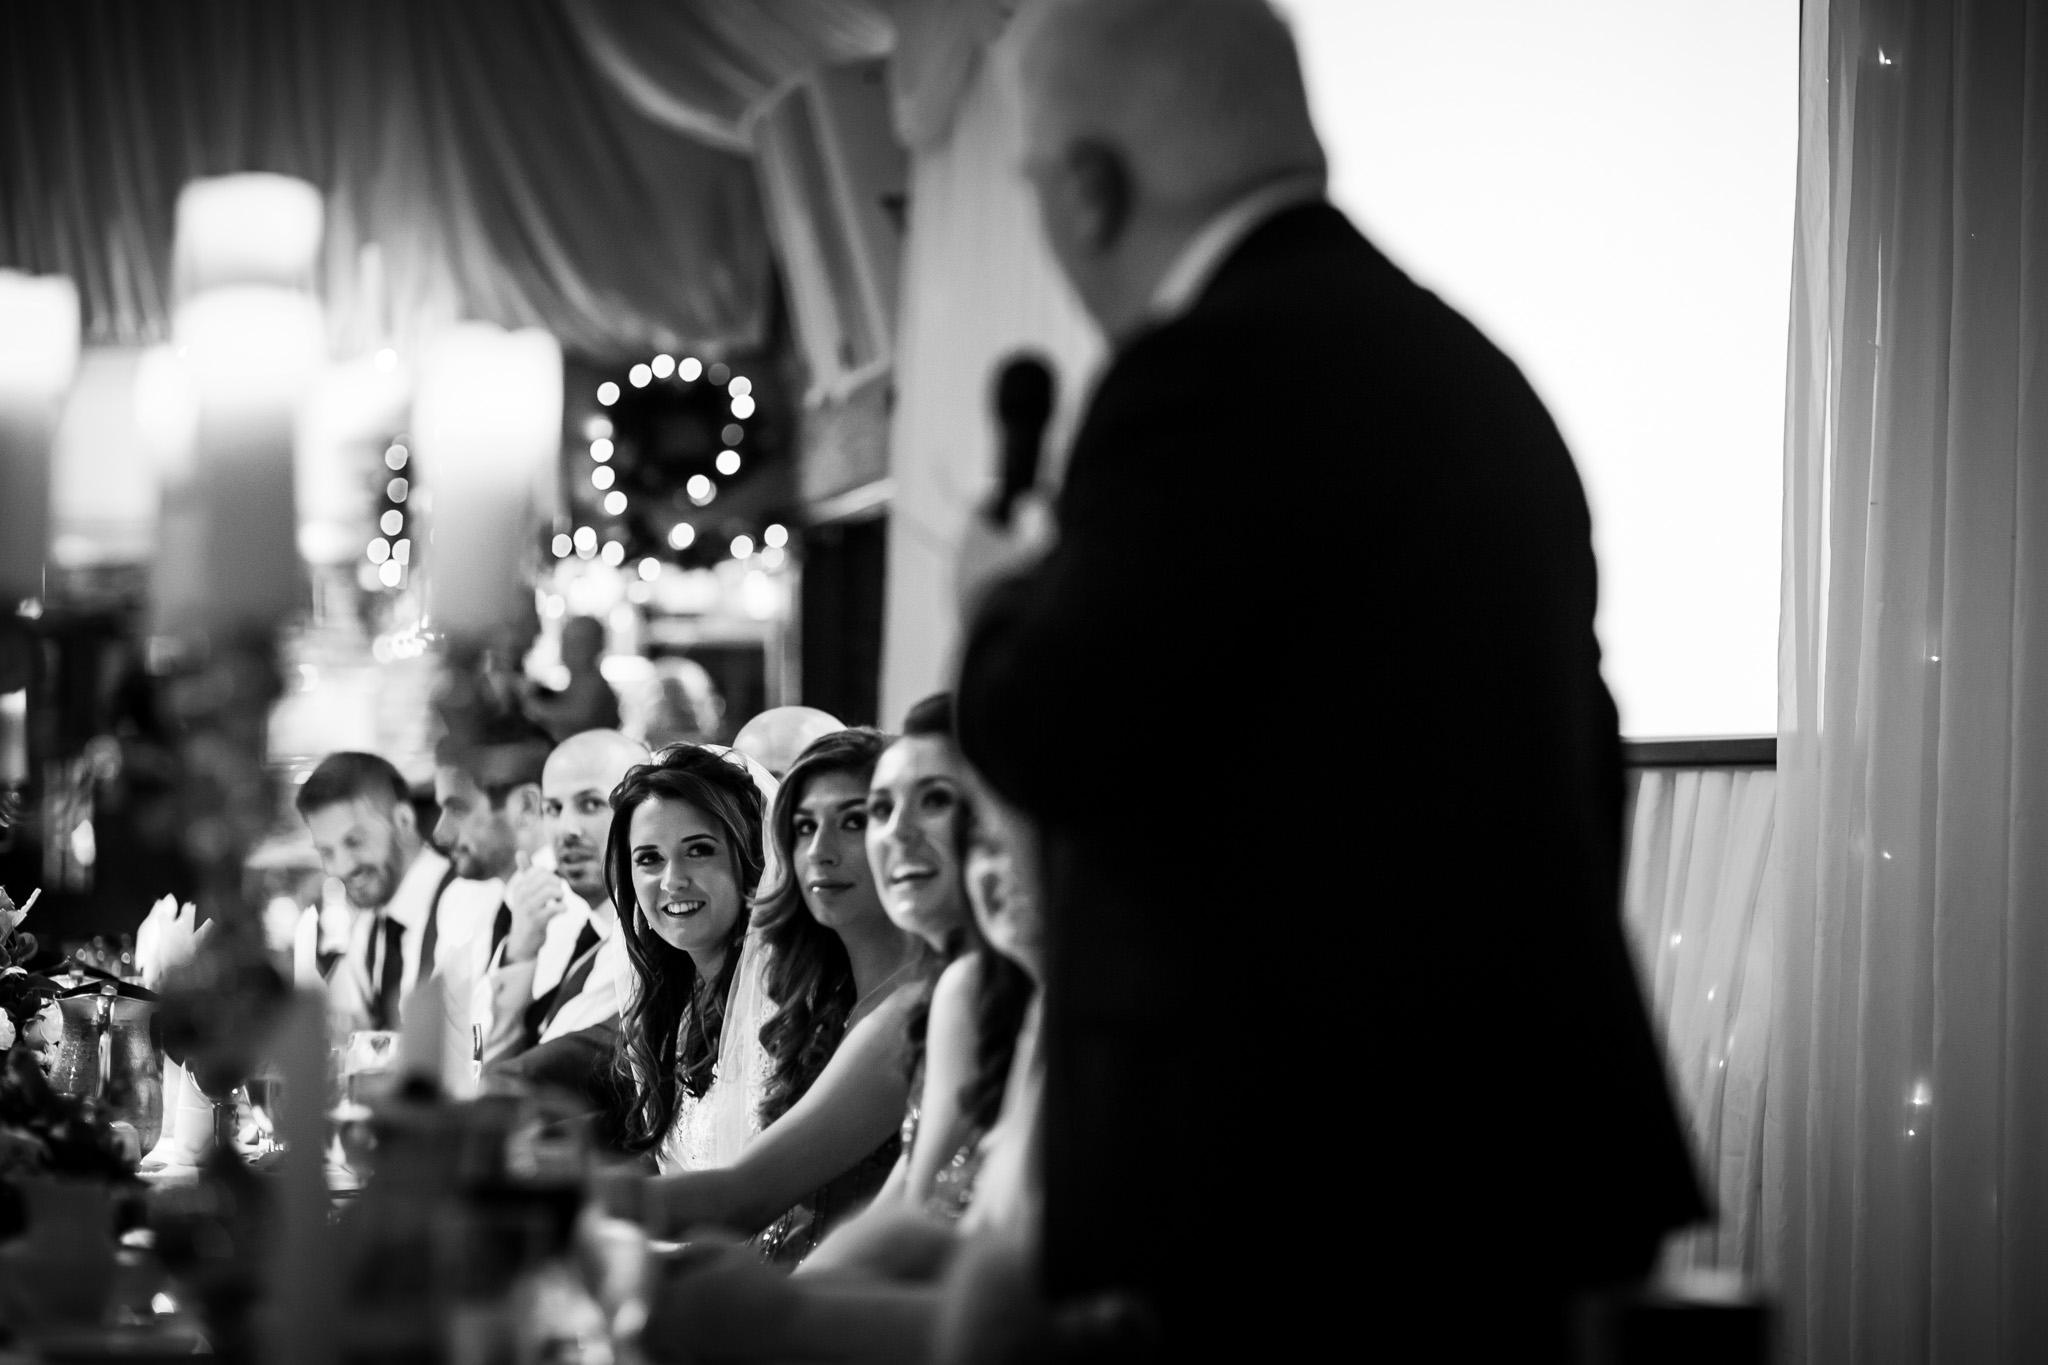 Mark_Barnes_Northern_Ireland_wedding_photographer_Harveys_Point_Donegall_Wedding_photography-Adam&Gemma-49.jpg